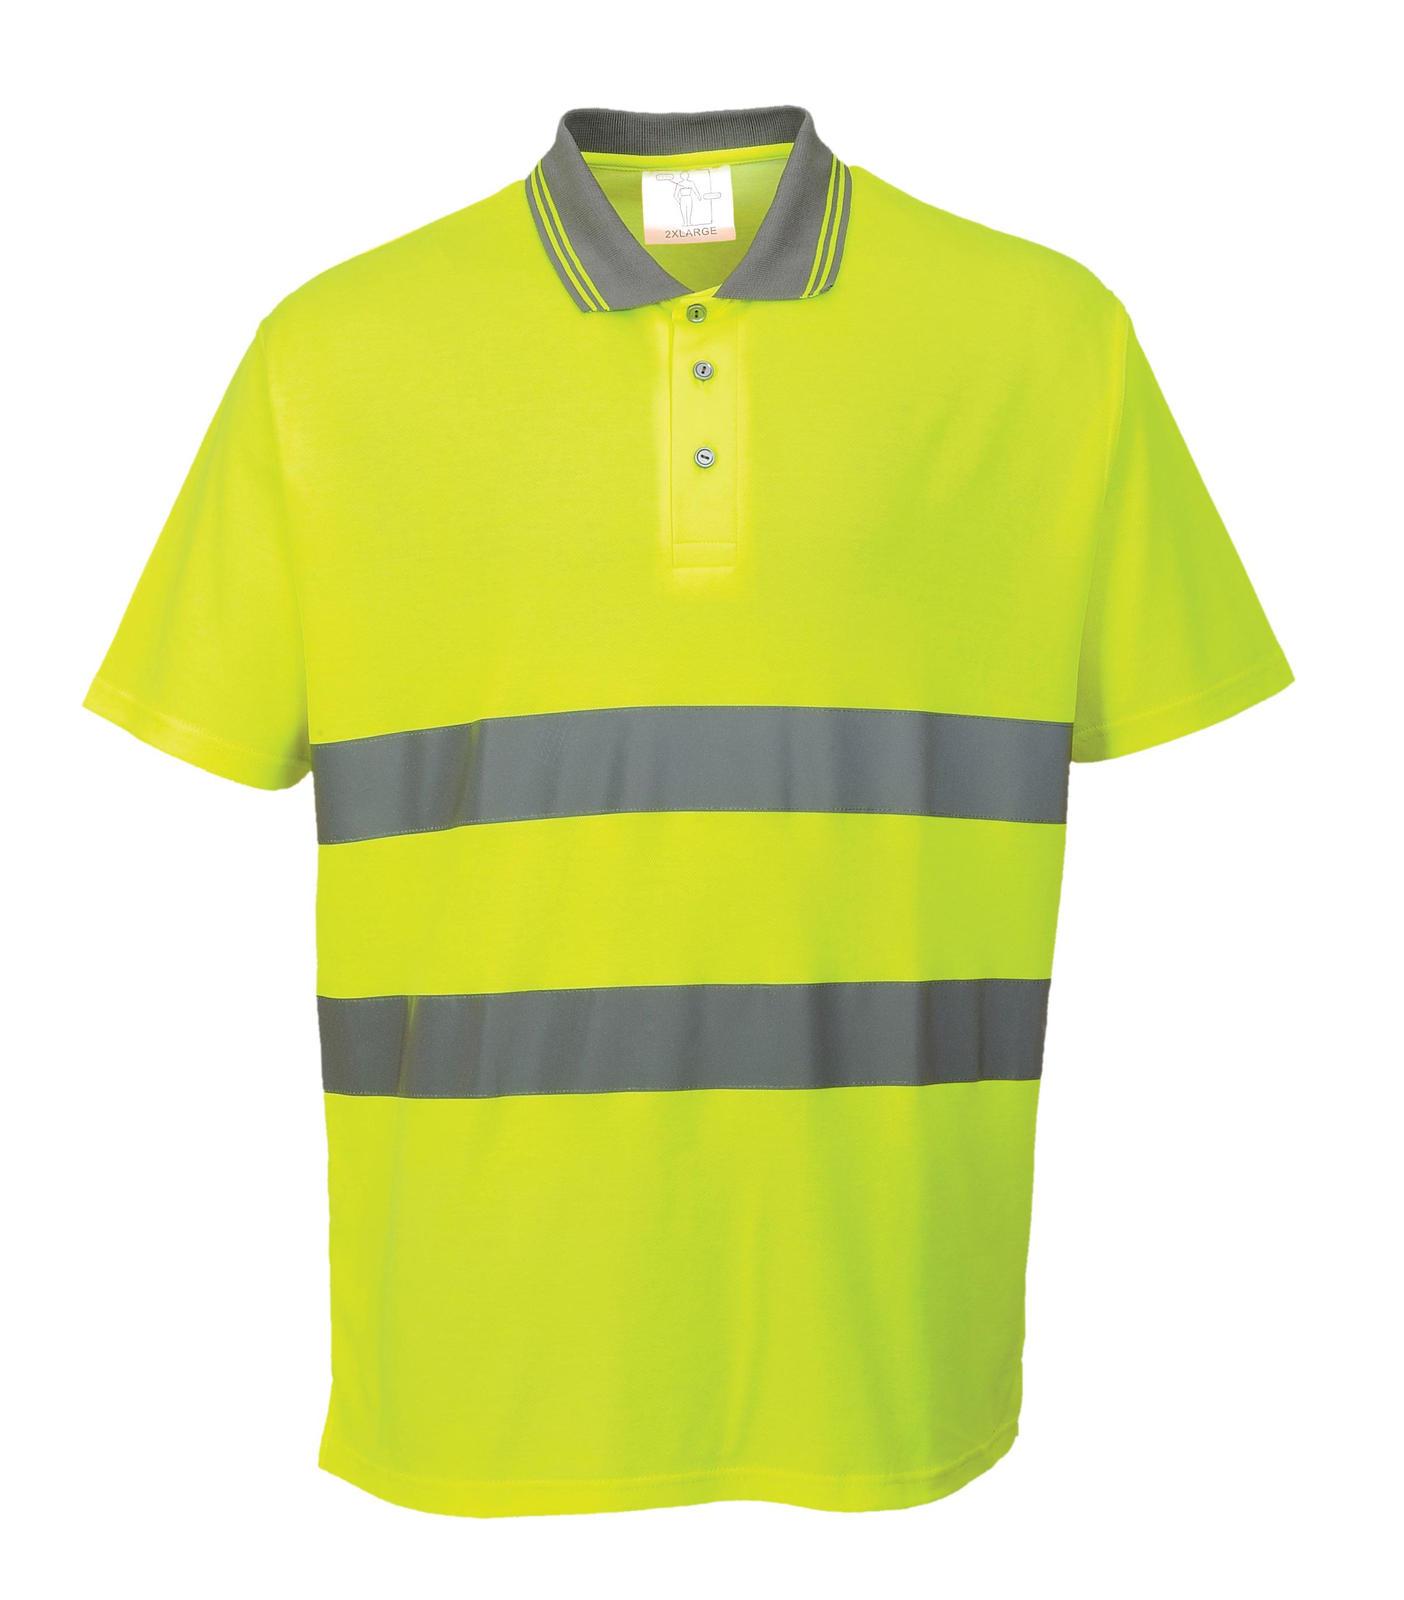 Portwest cotton comfort breathable high visibility polo for Hi vis t shirts cotton